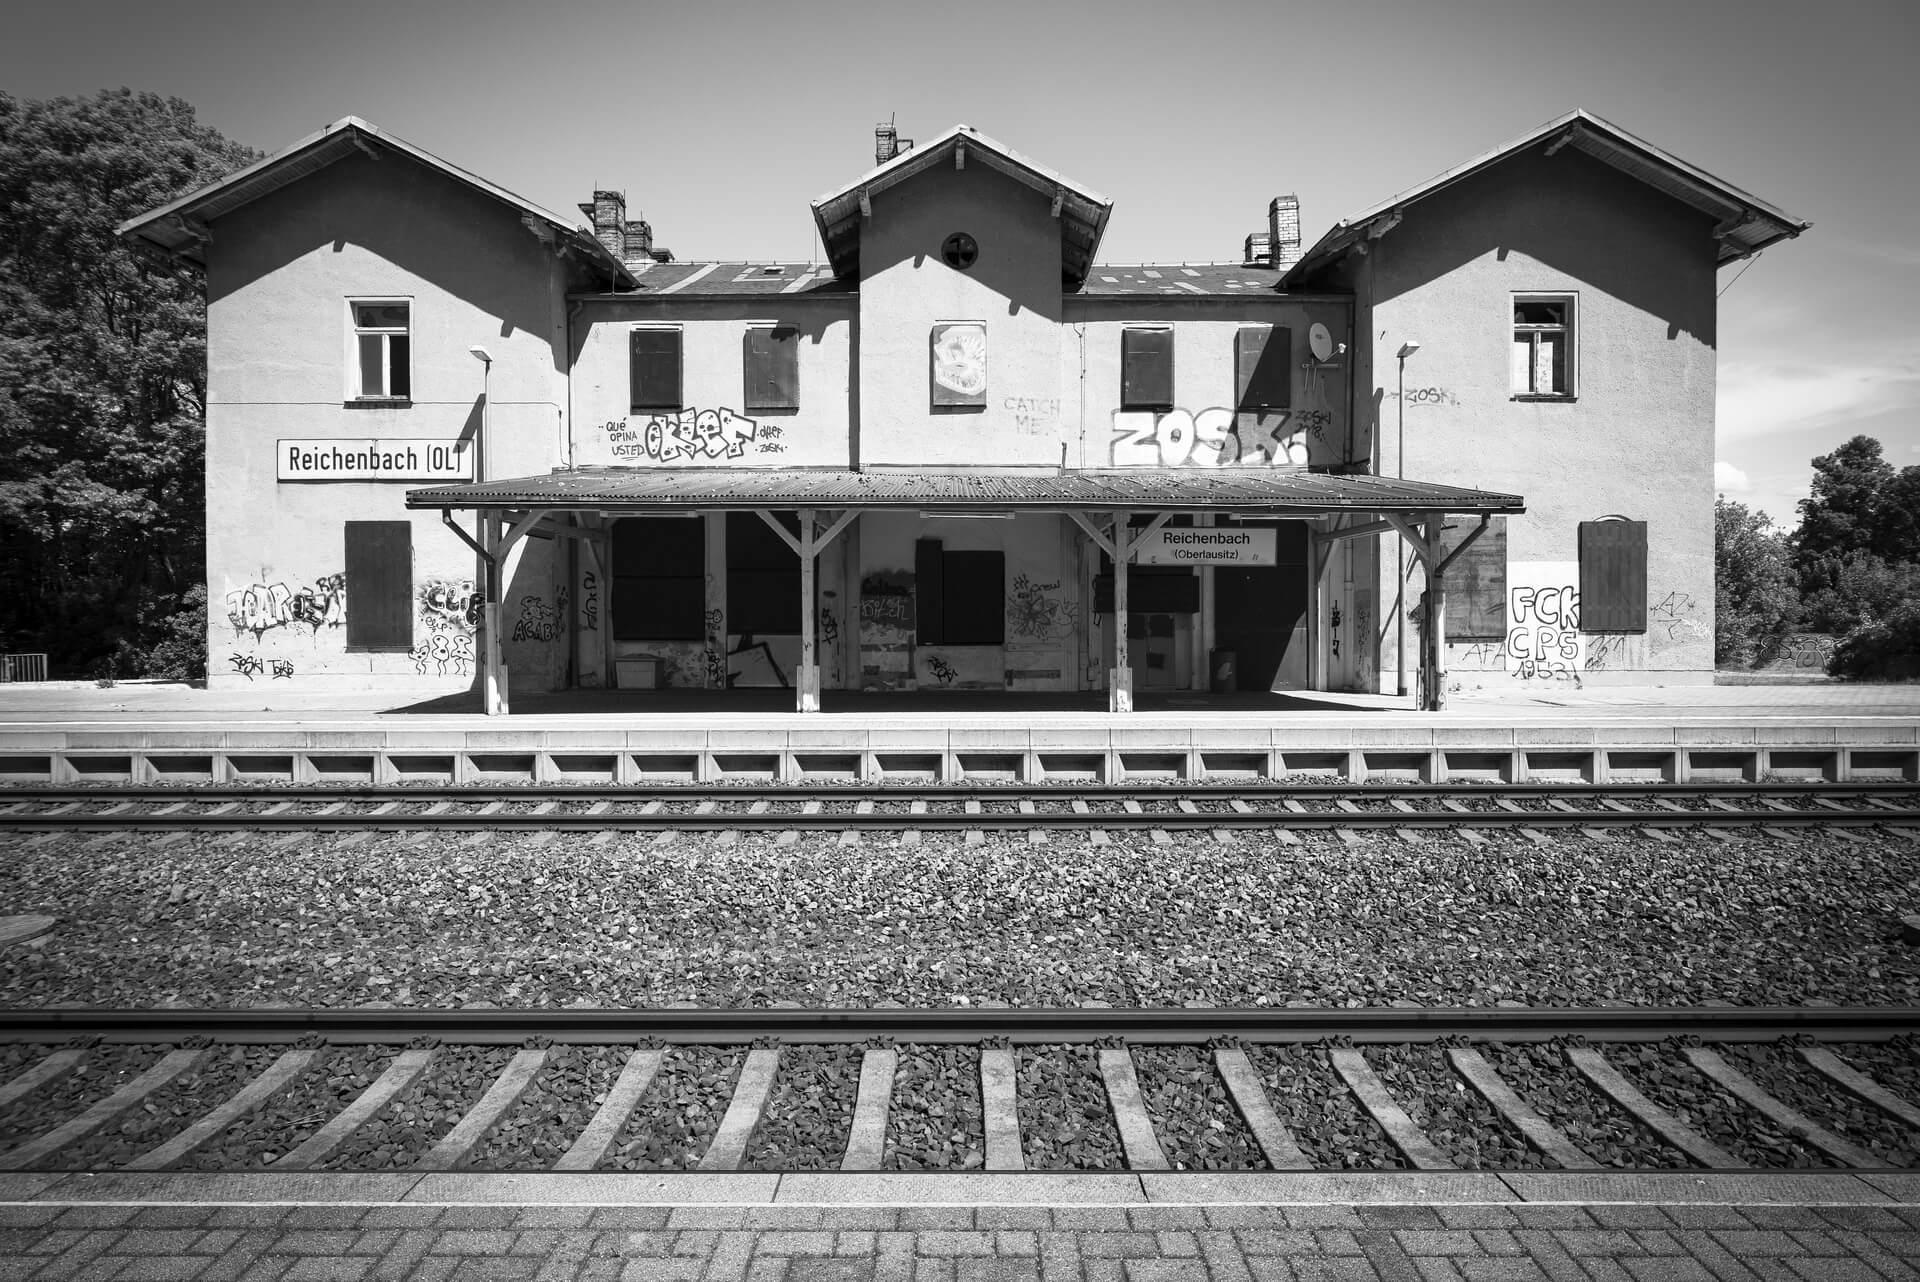 Reichenbach, Bahnhof